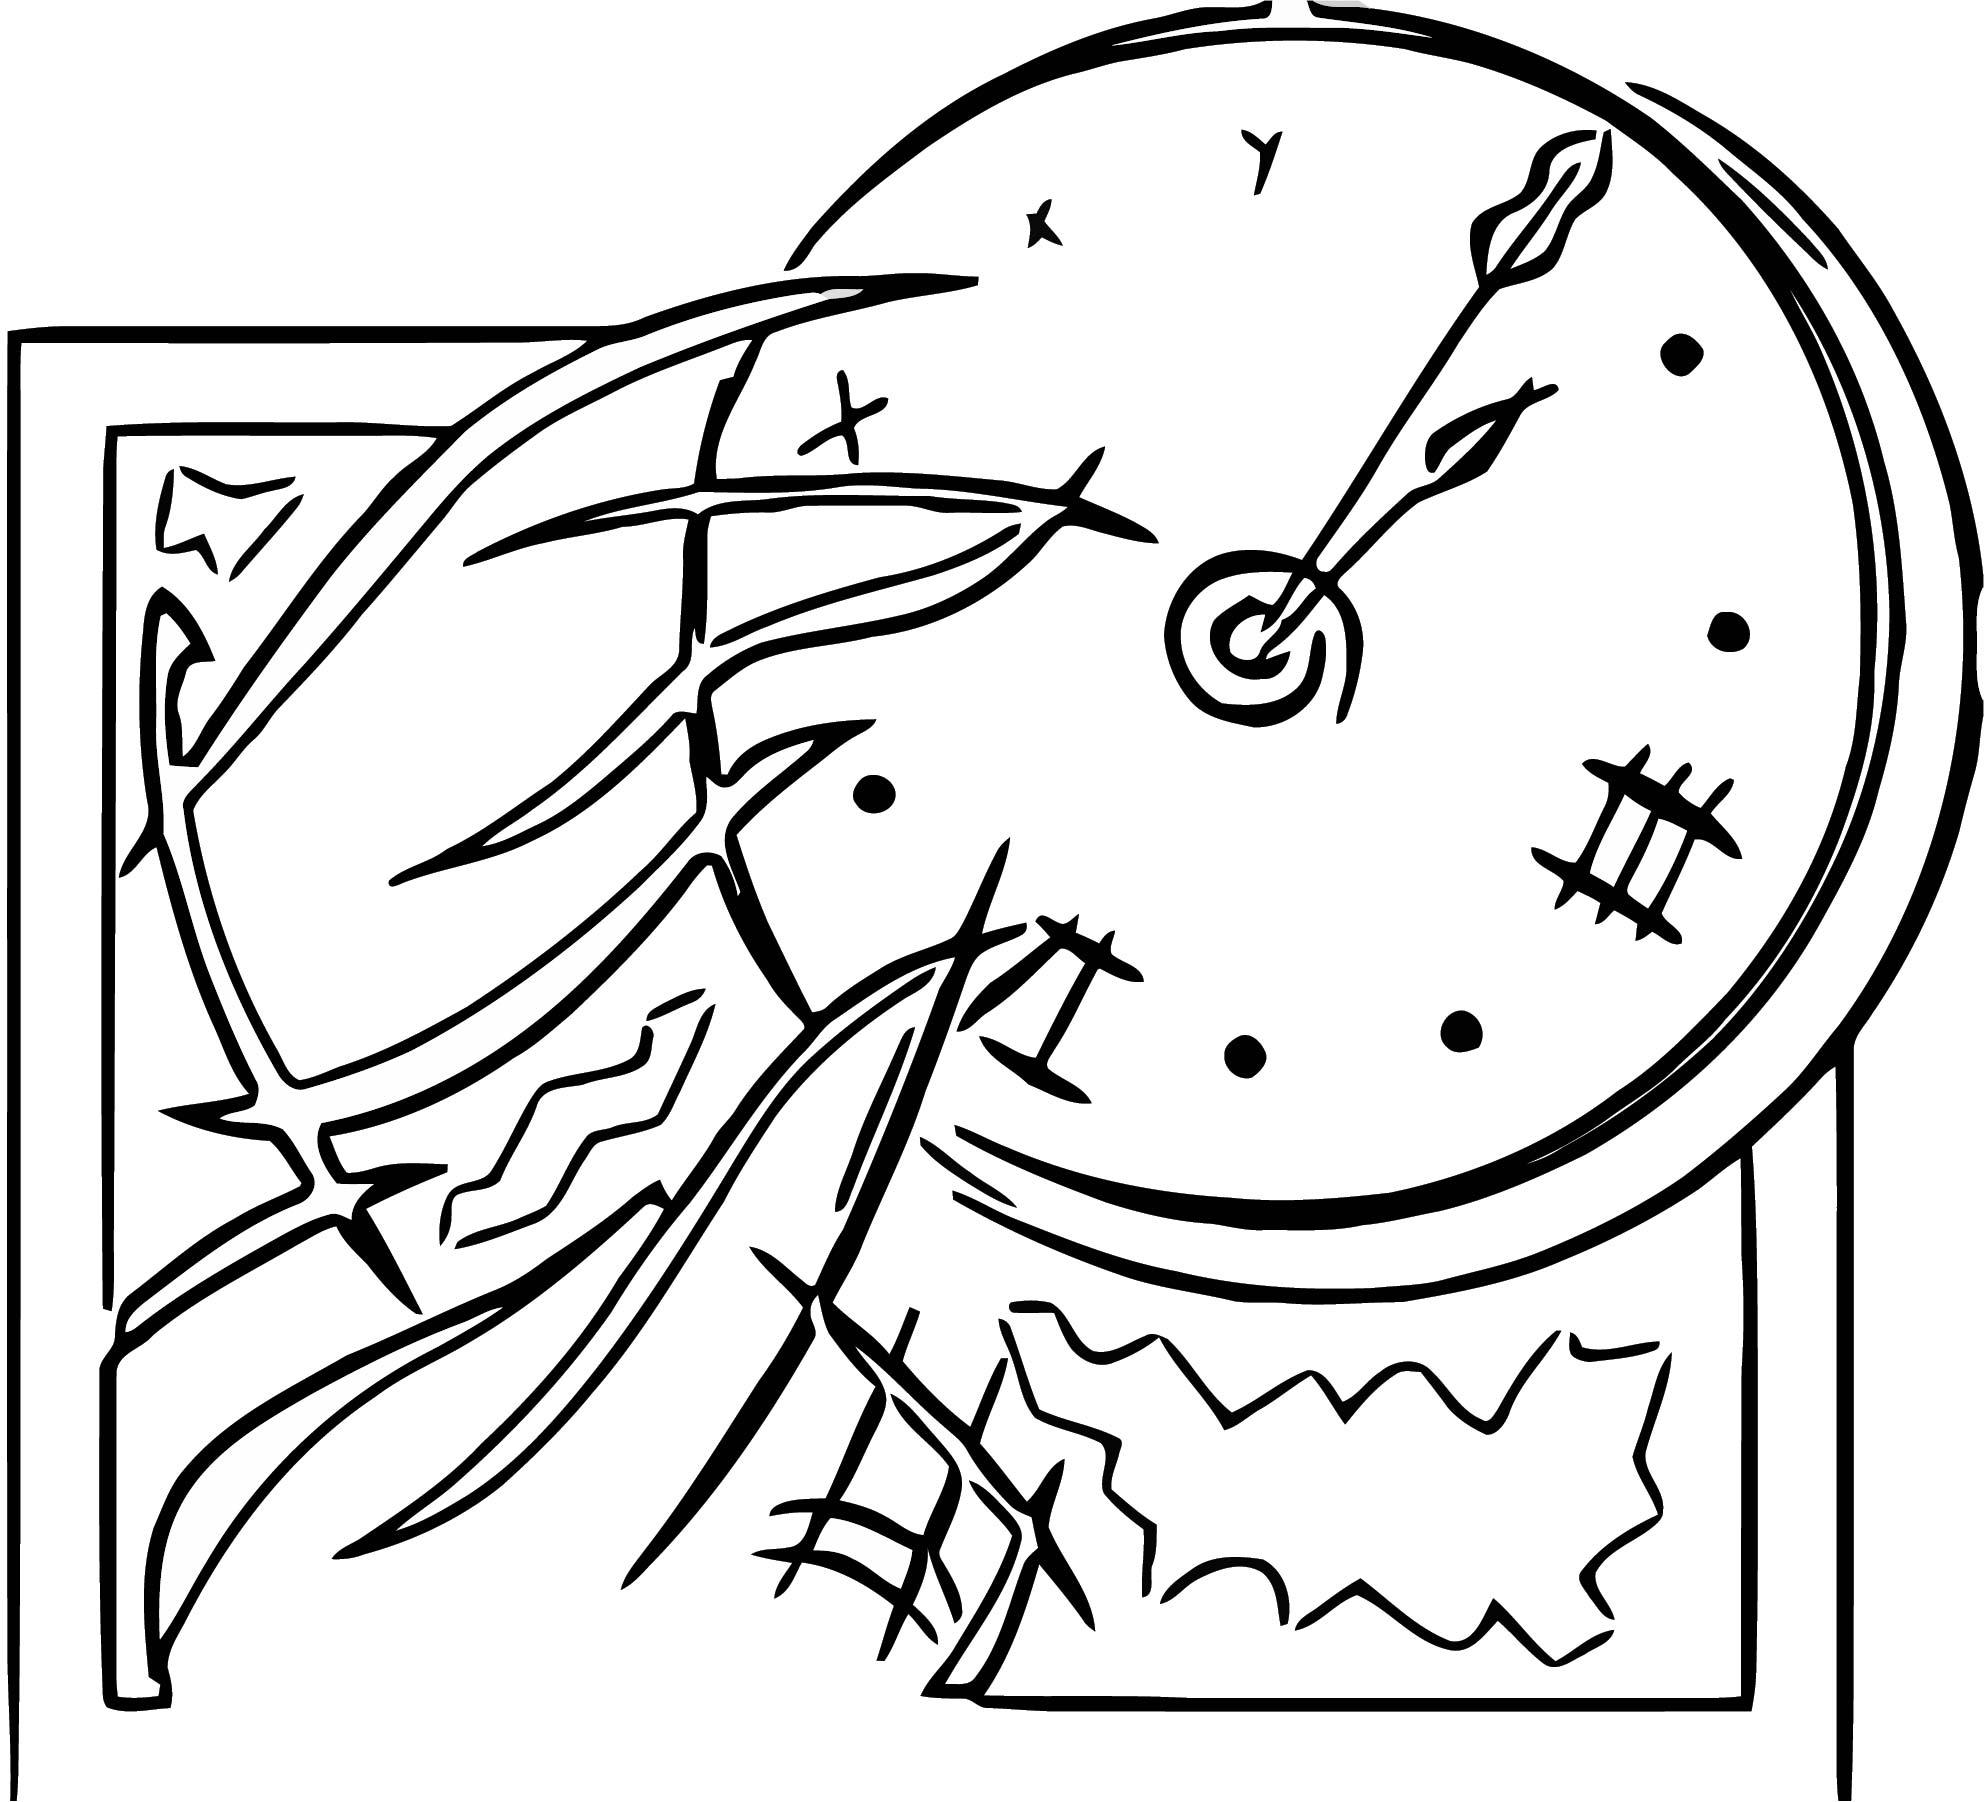 Clock Free Printable 1 Cartoonized Free Printable Coloring Page